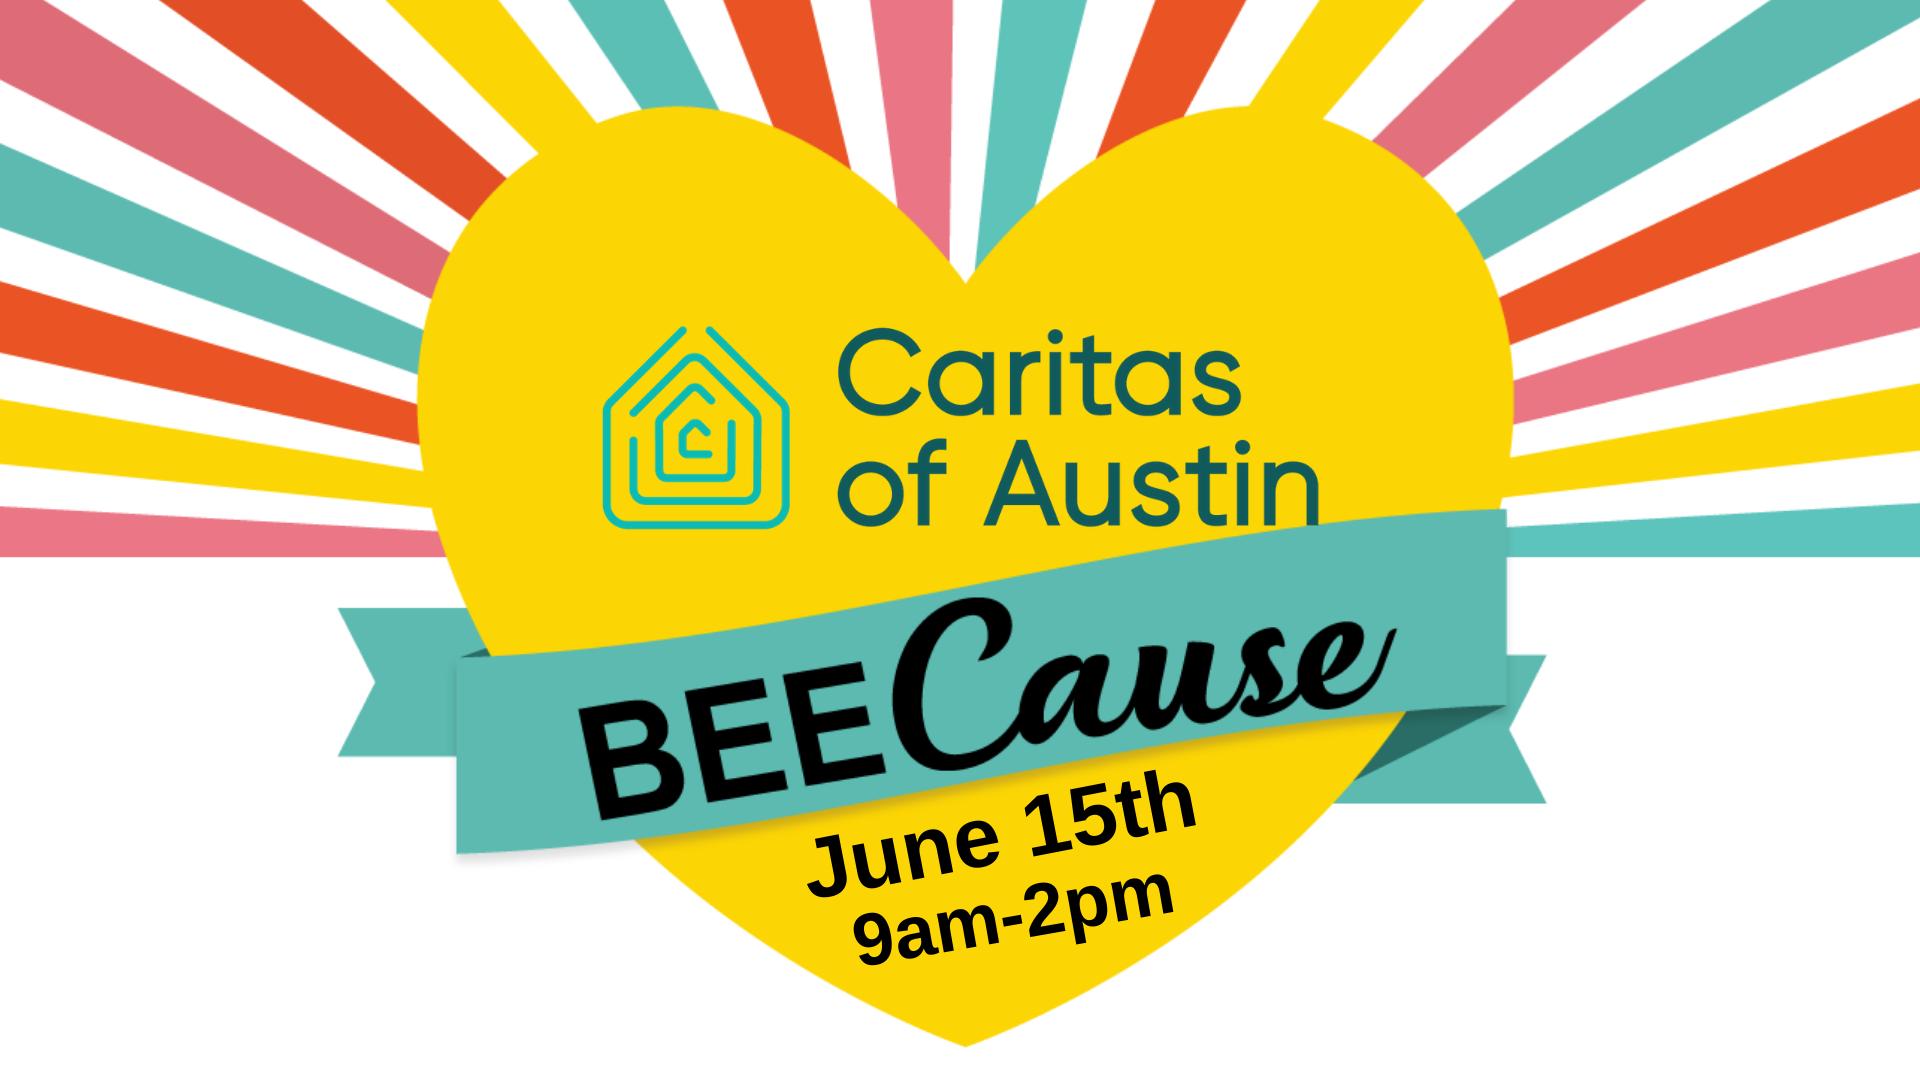 BeeCause: Caritas Fundraiser